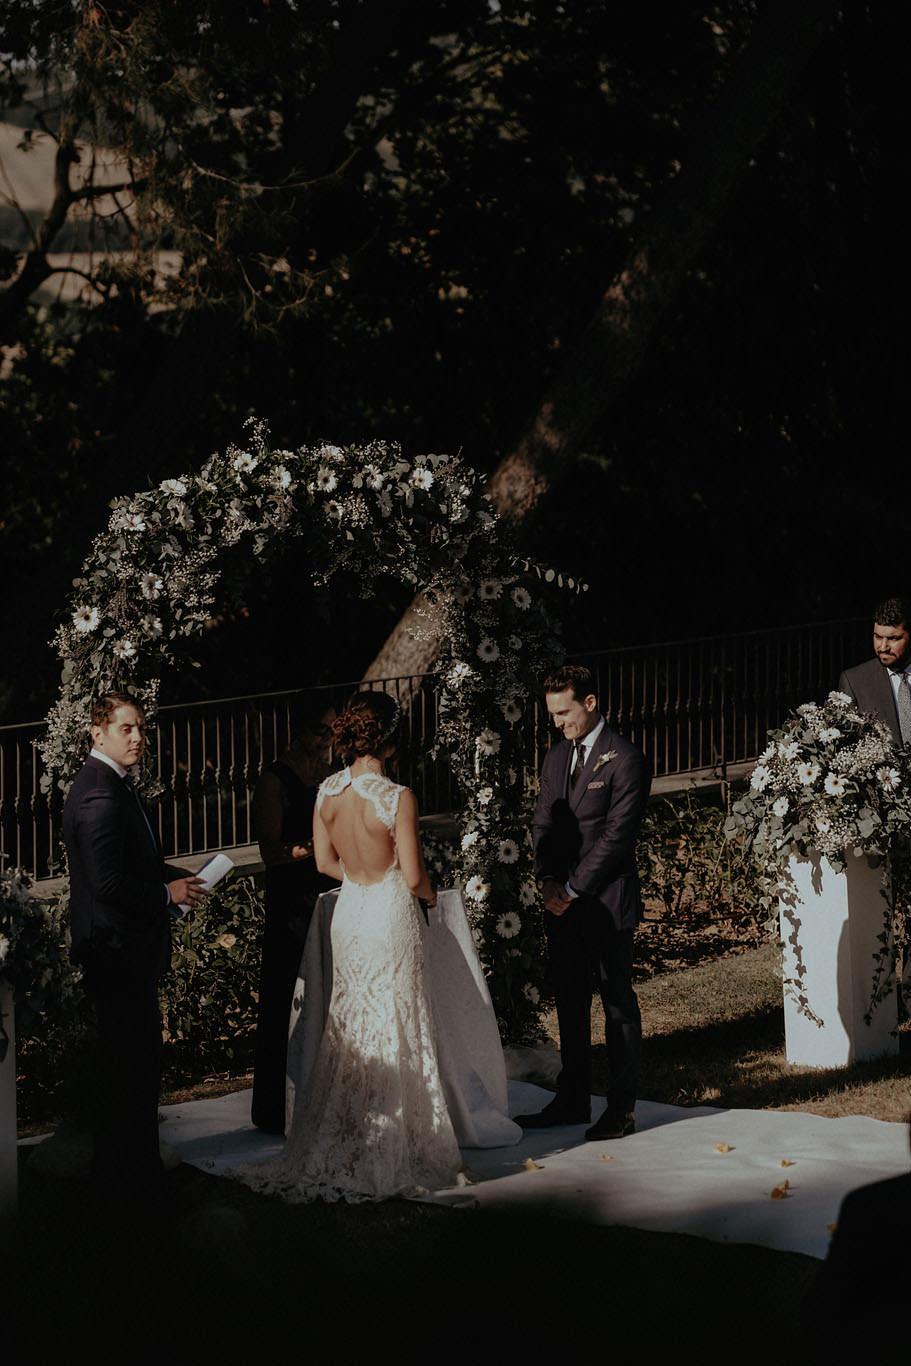 Max-Steph-Italy-Wedding-389.jpg